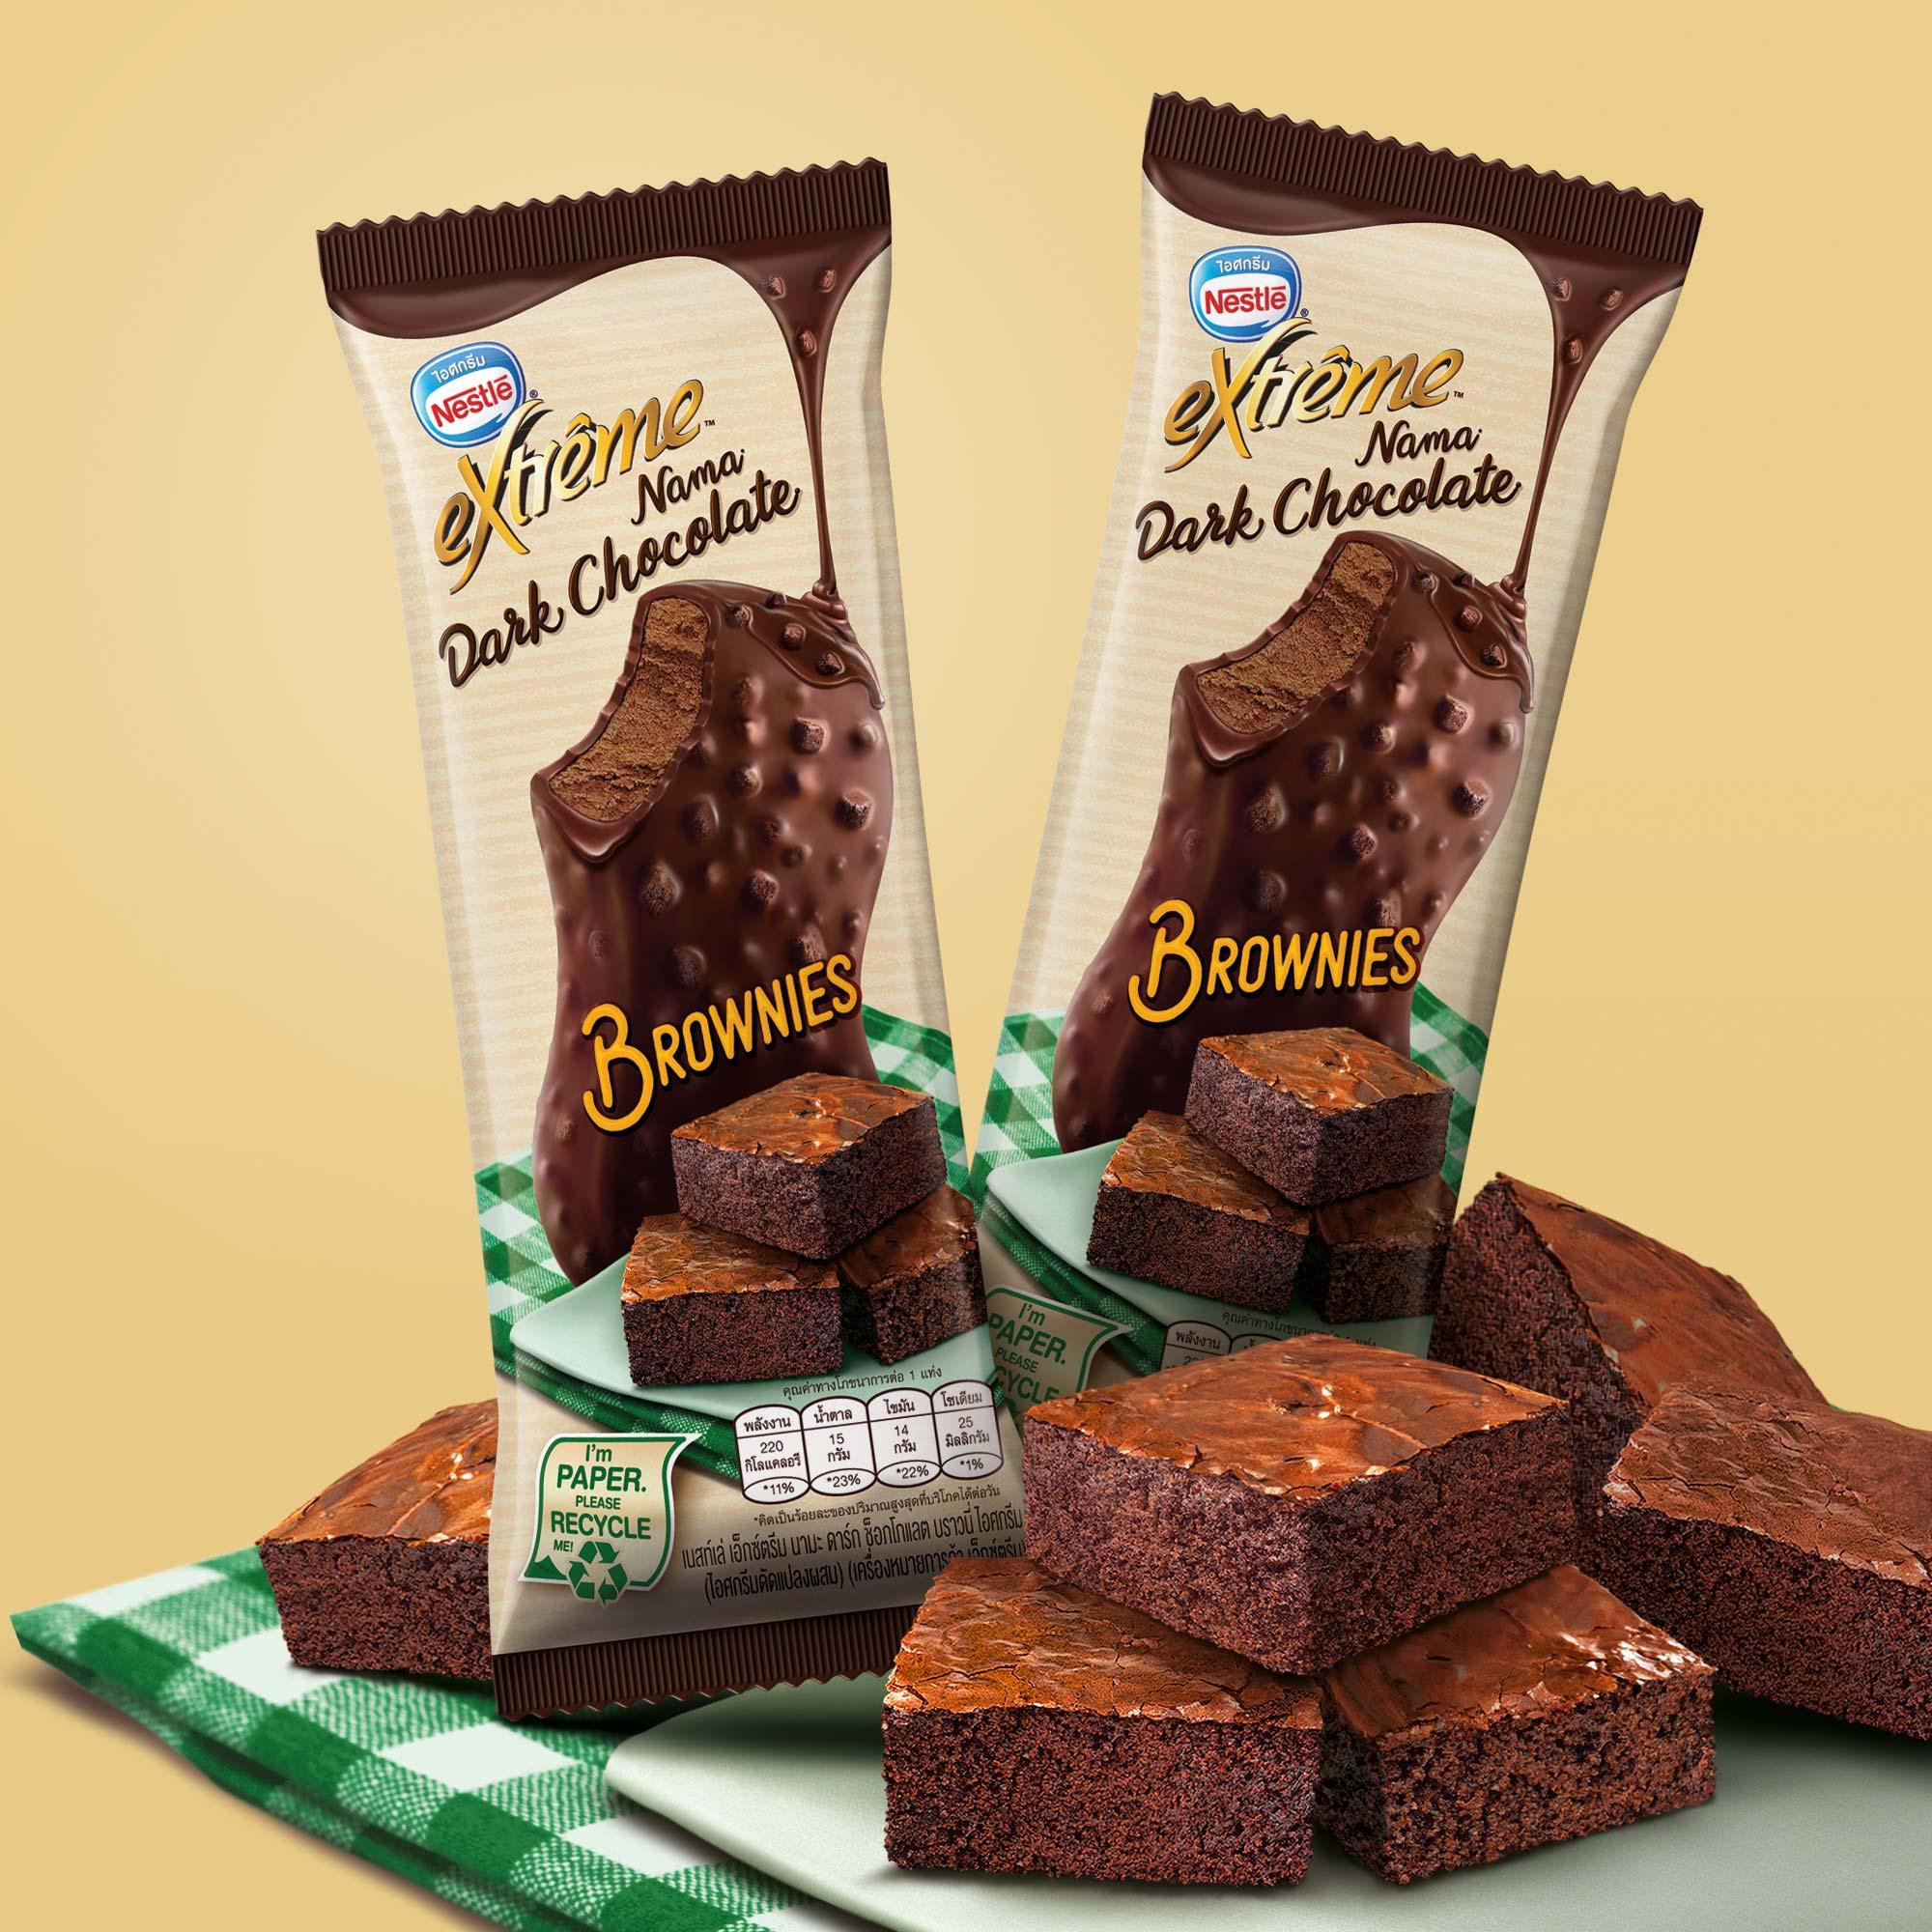 Nestle Ice Cream Chocolate Brownie Brand Packaging